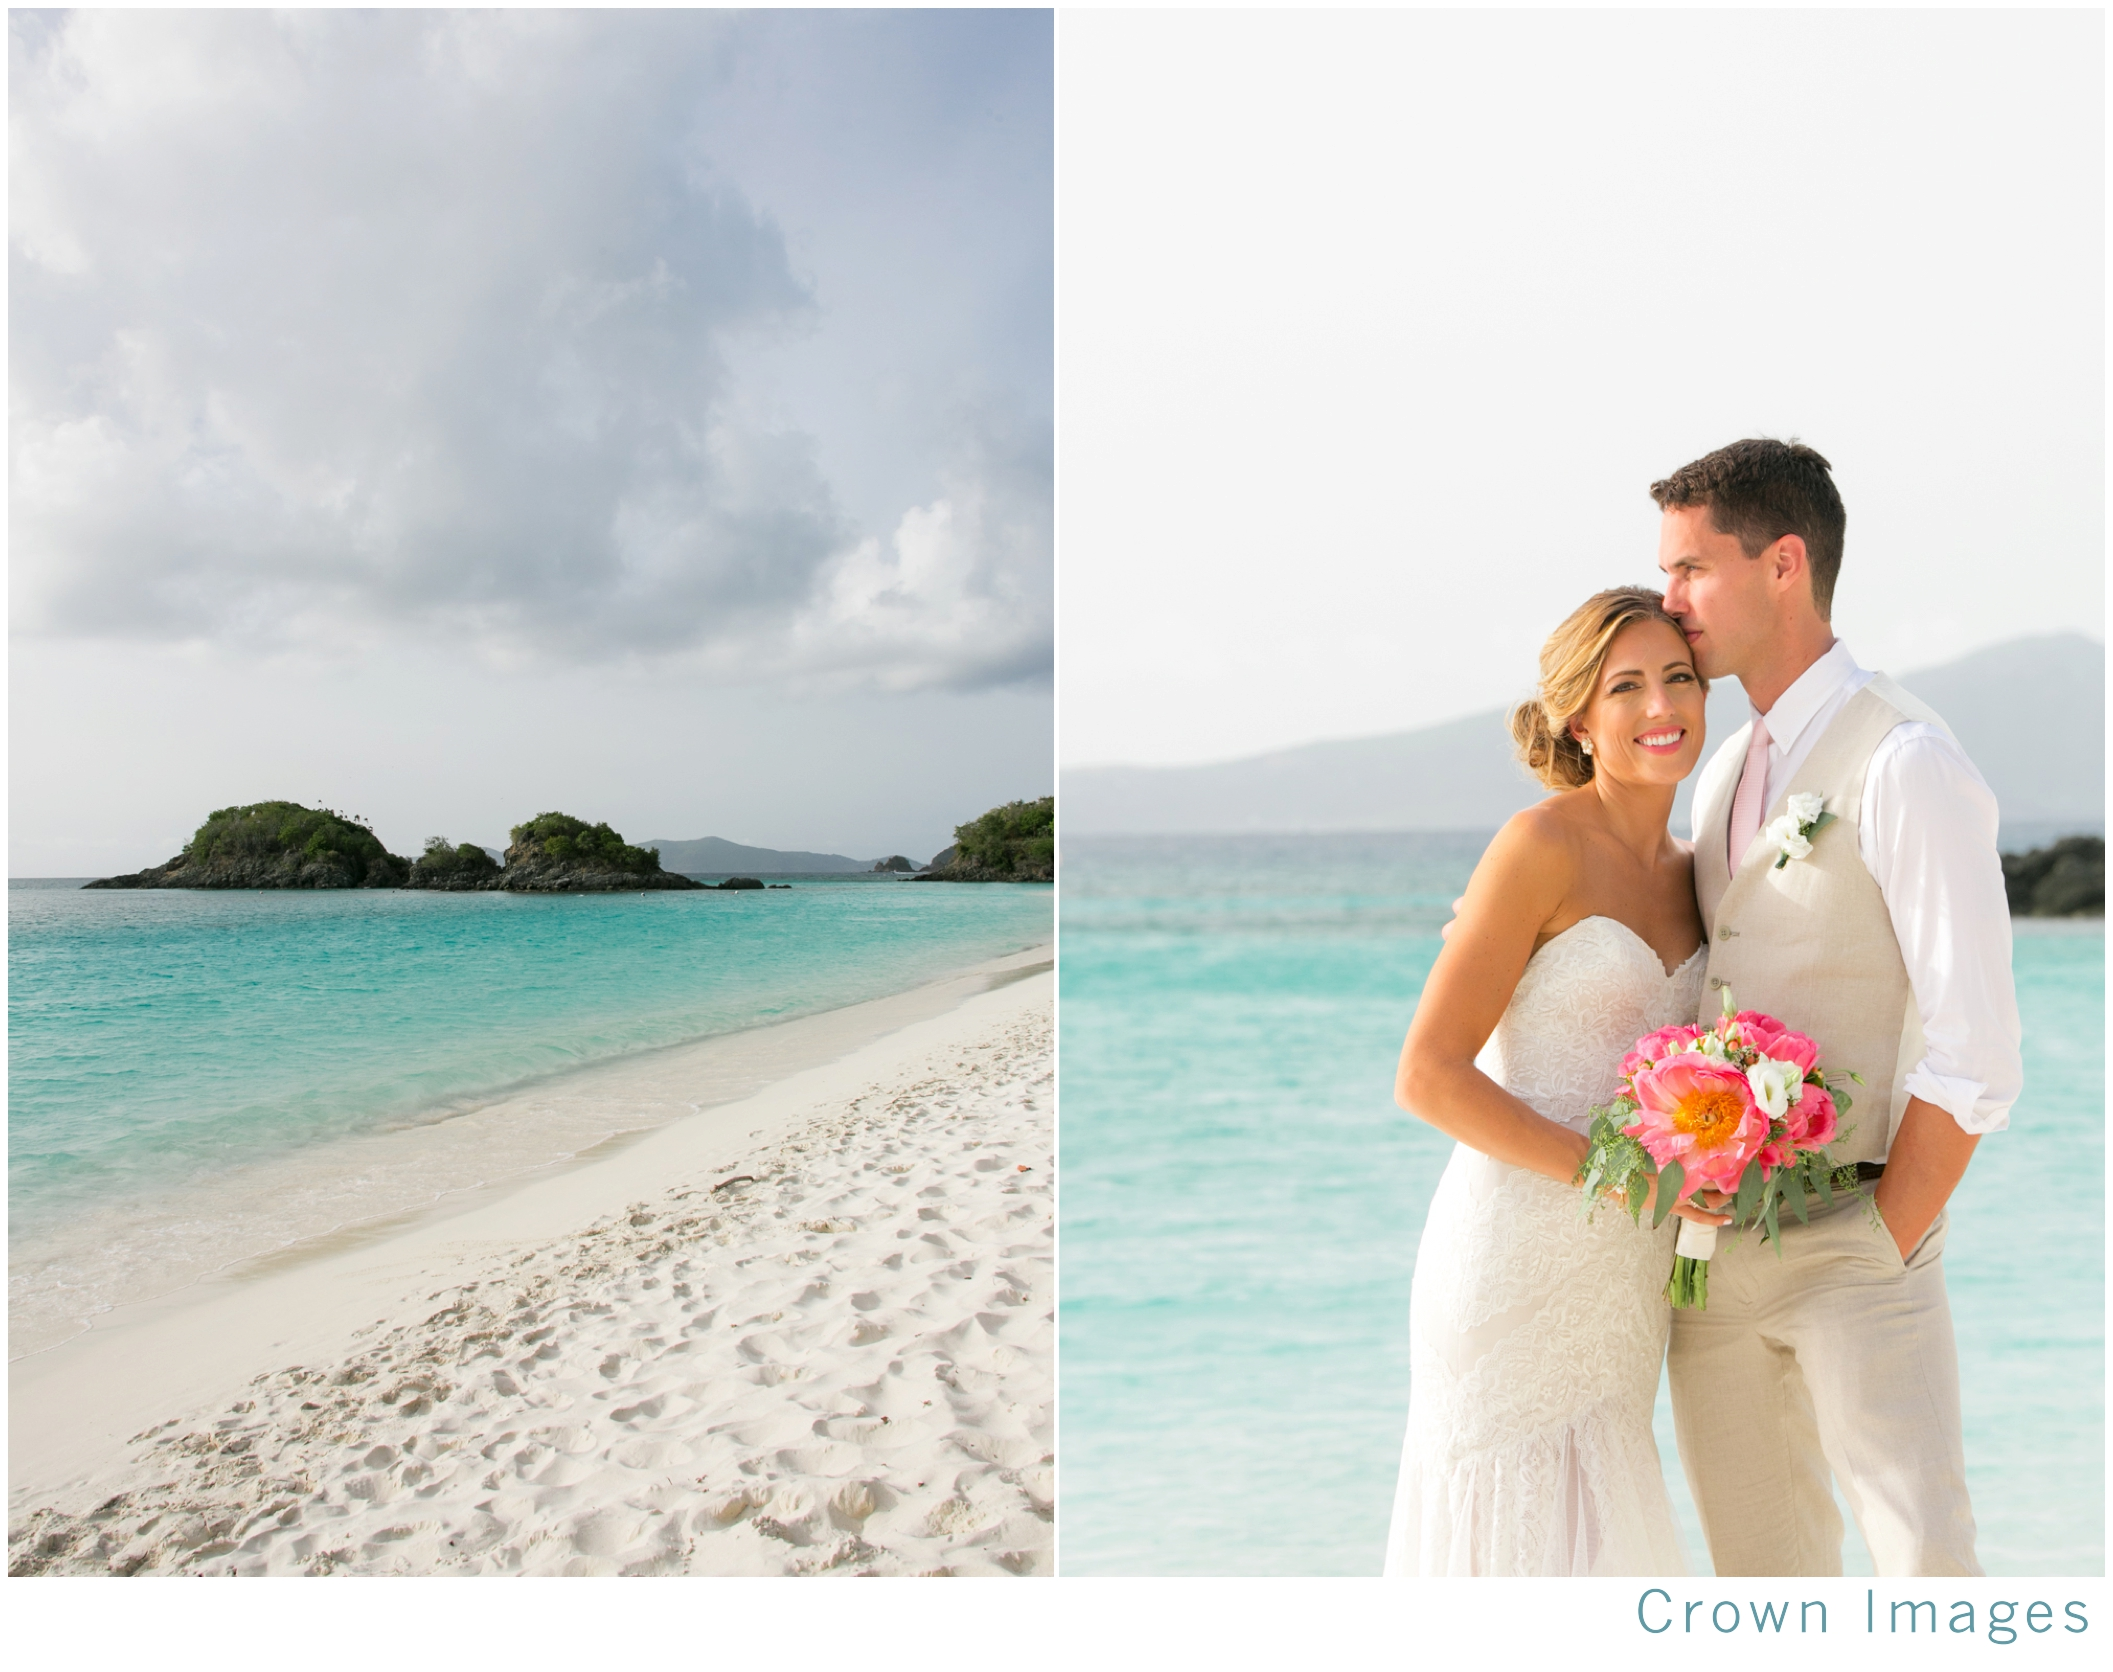 wedding photos crown images_1666.jpg